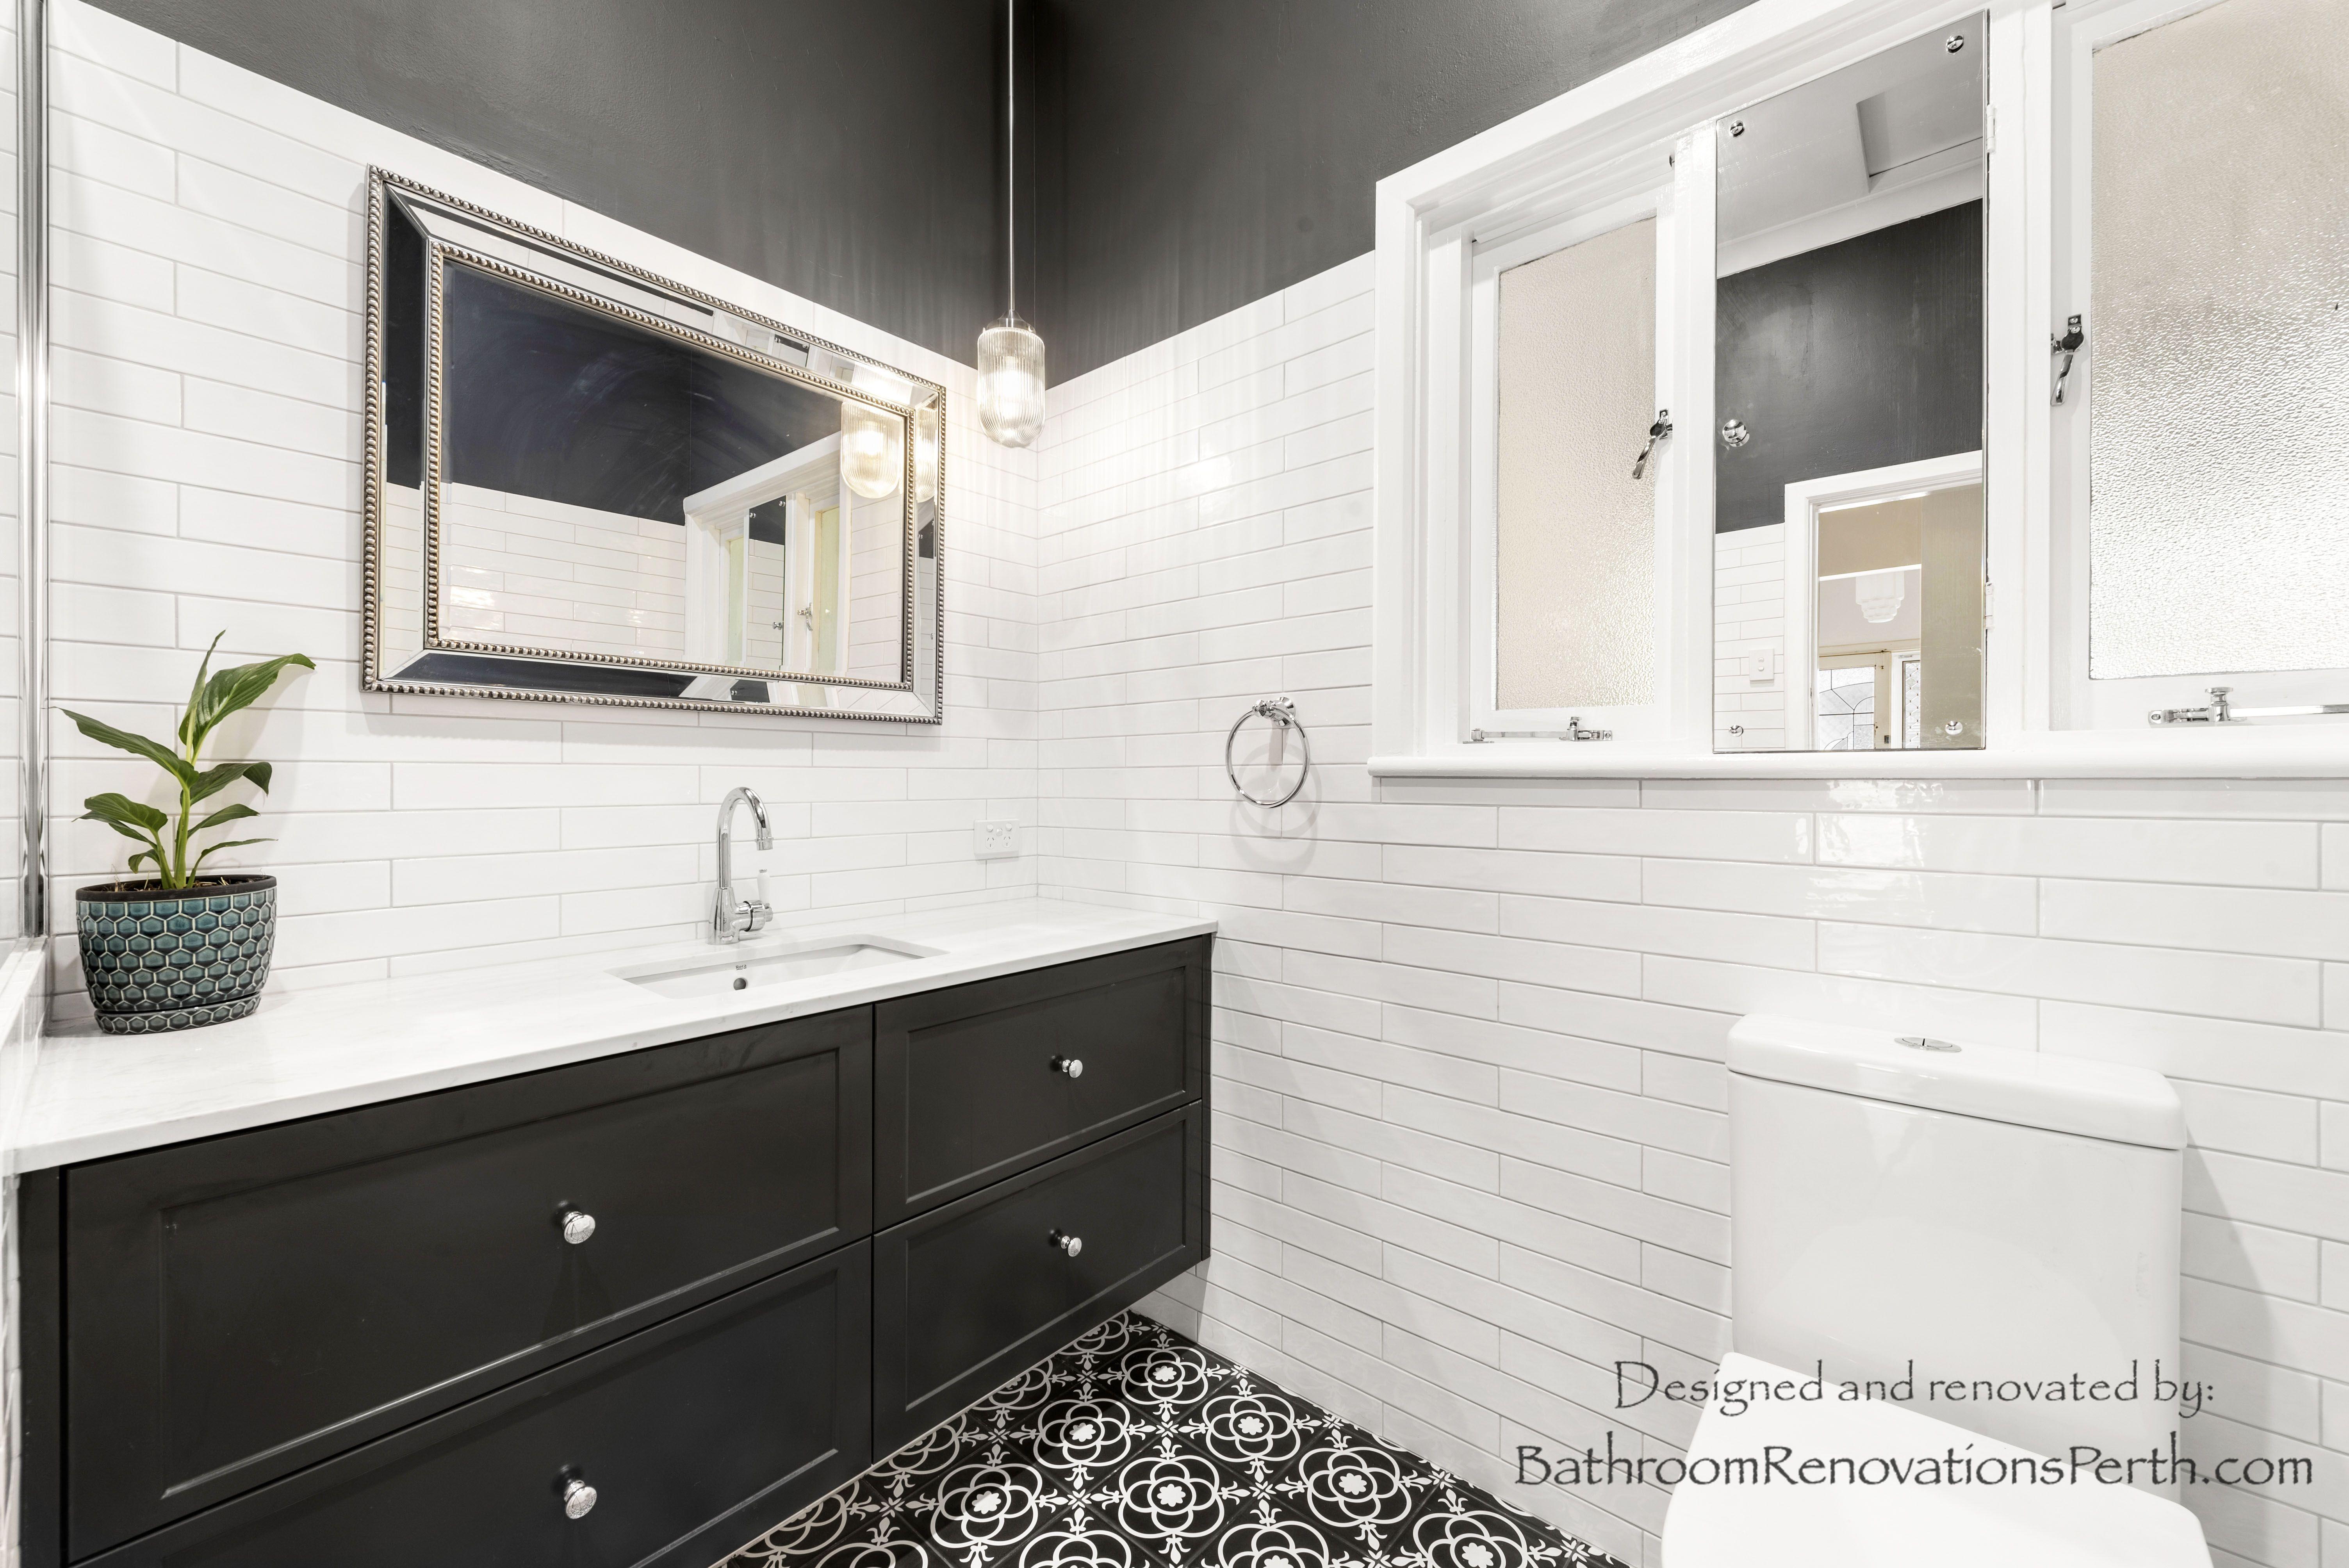 Exquisite bathroom bathroom renovation trends small